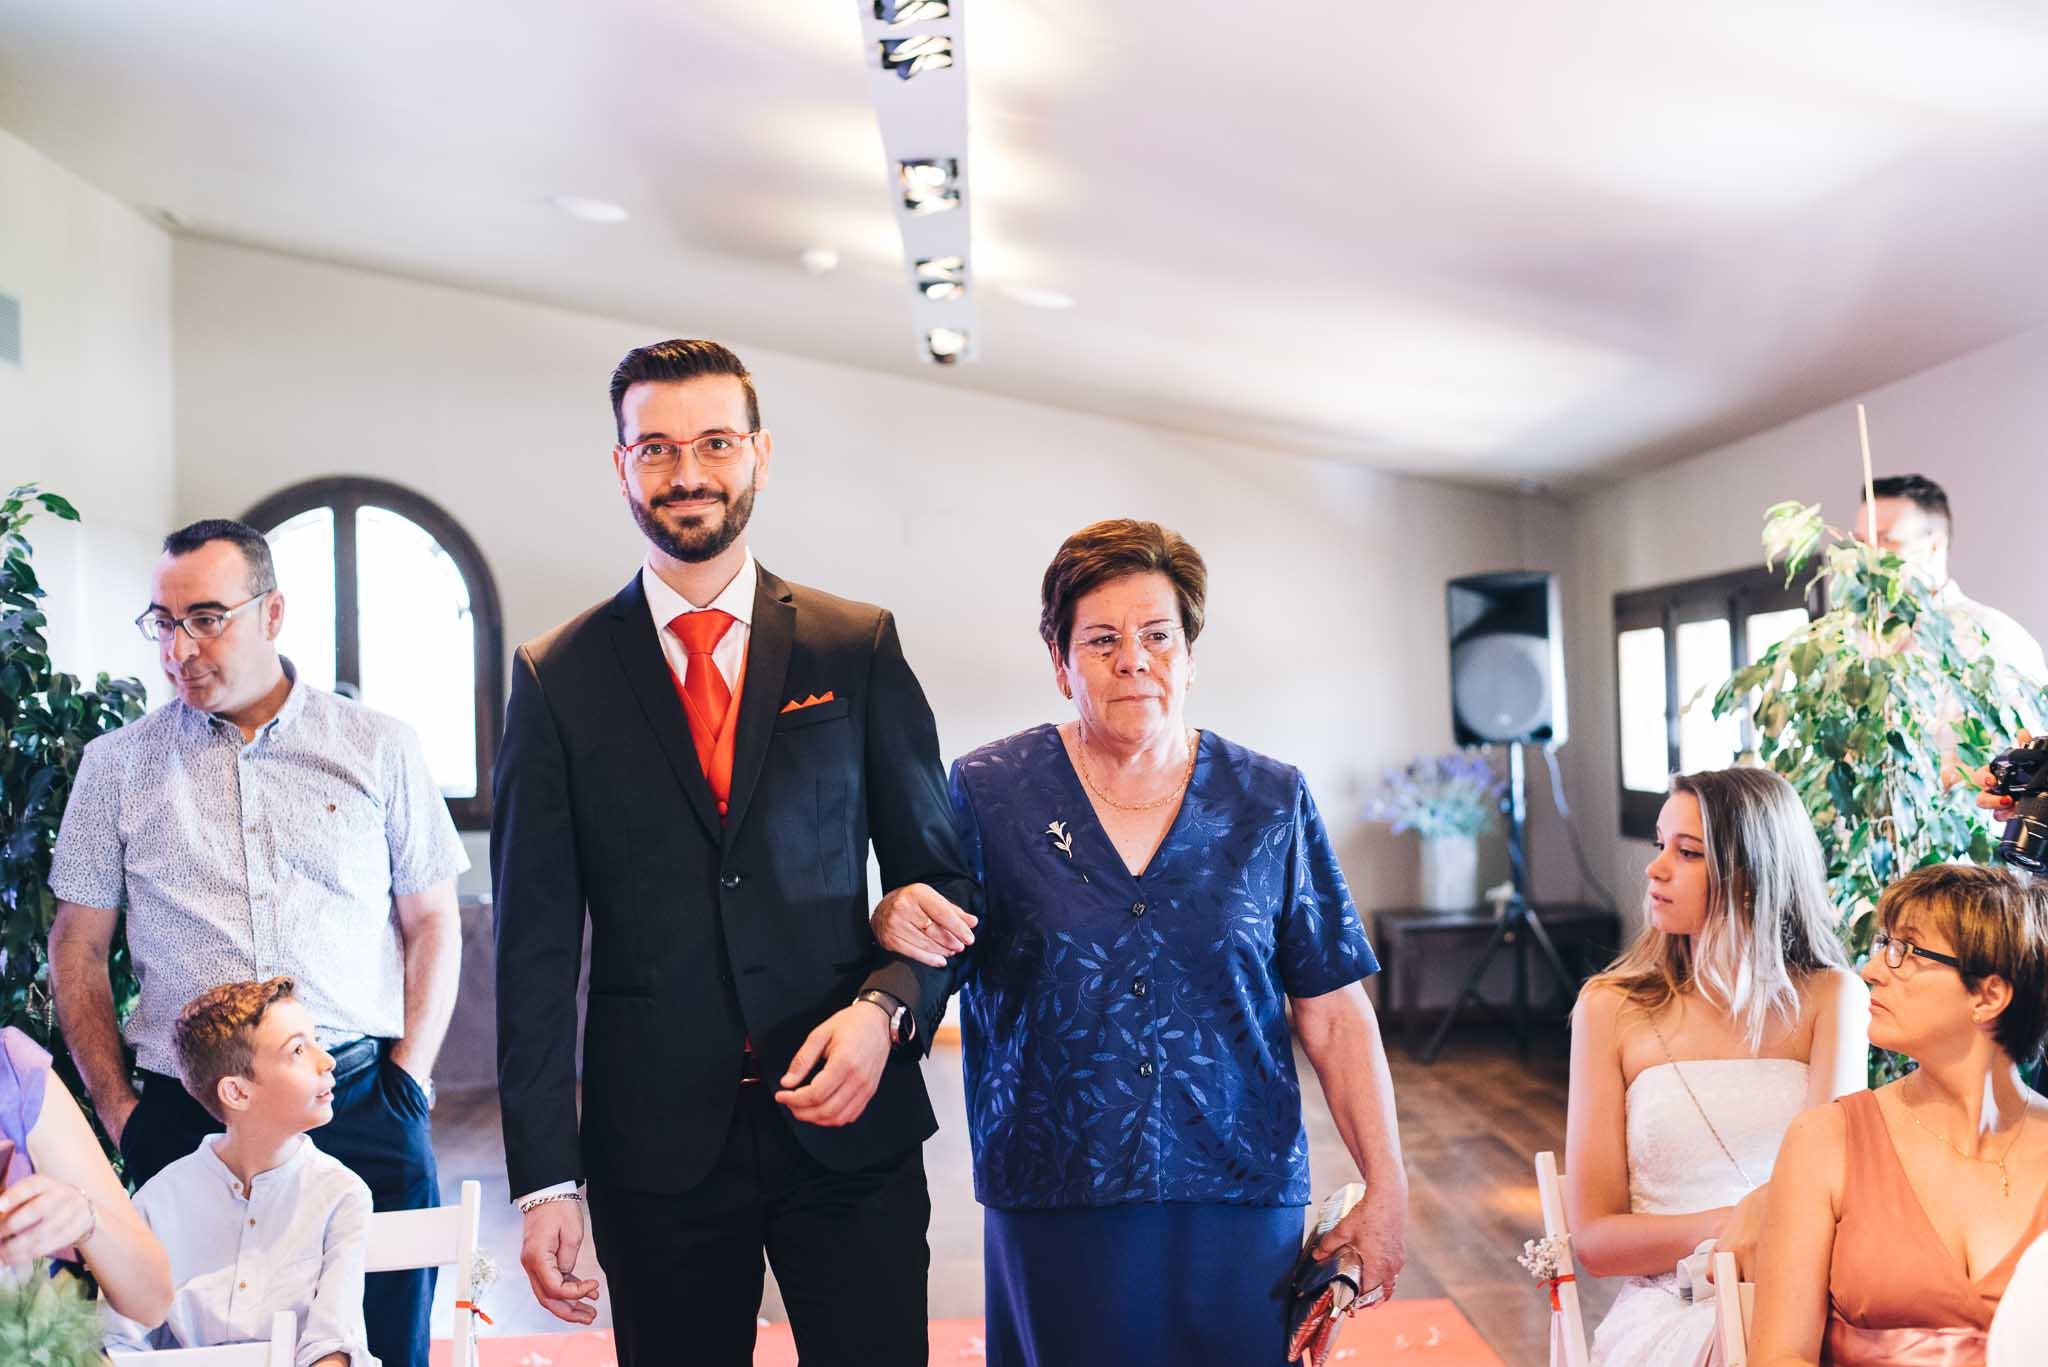 fotoperiodismo-laura-arroyo-fotografia-de-boda-hotel-qgat-san-cugat-barcelona-32